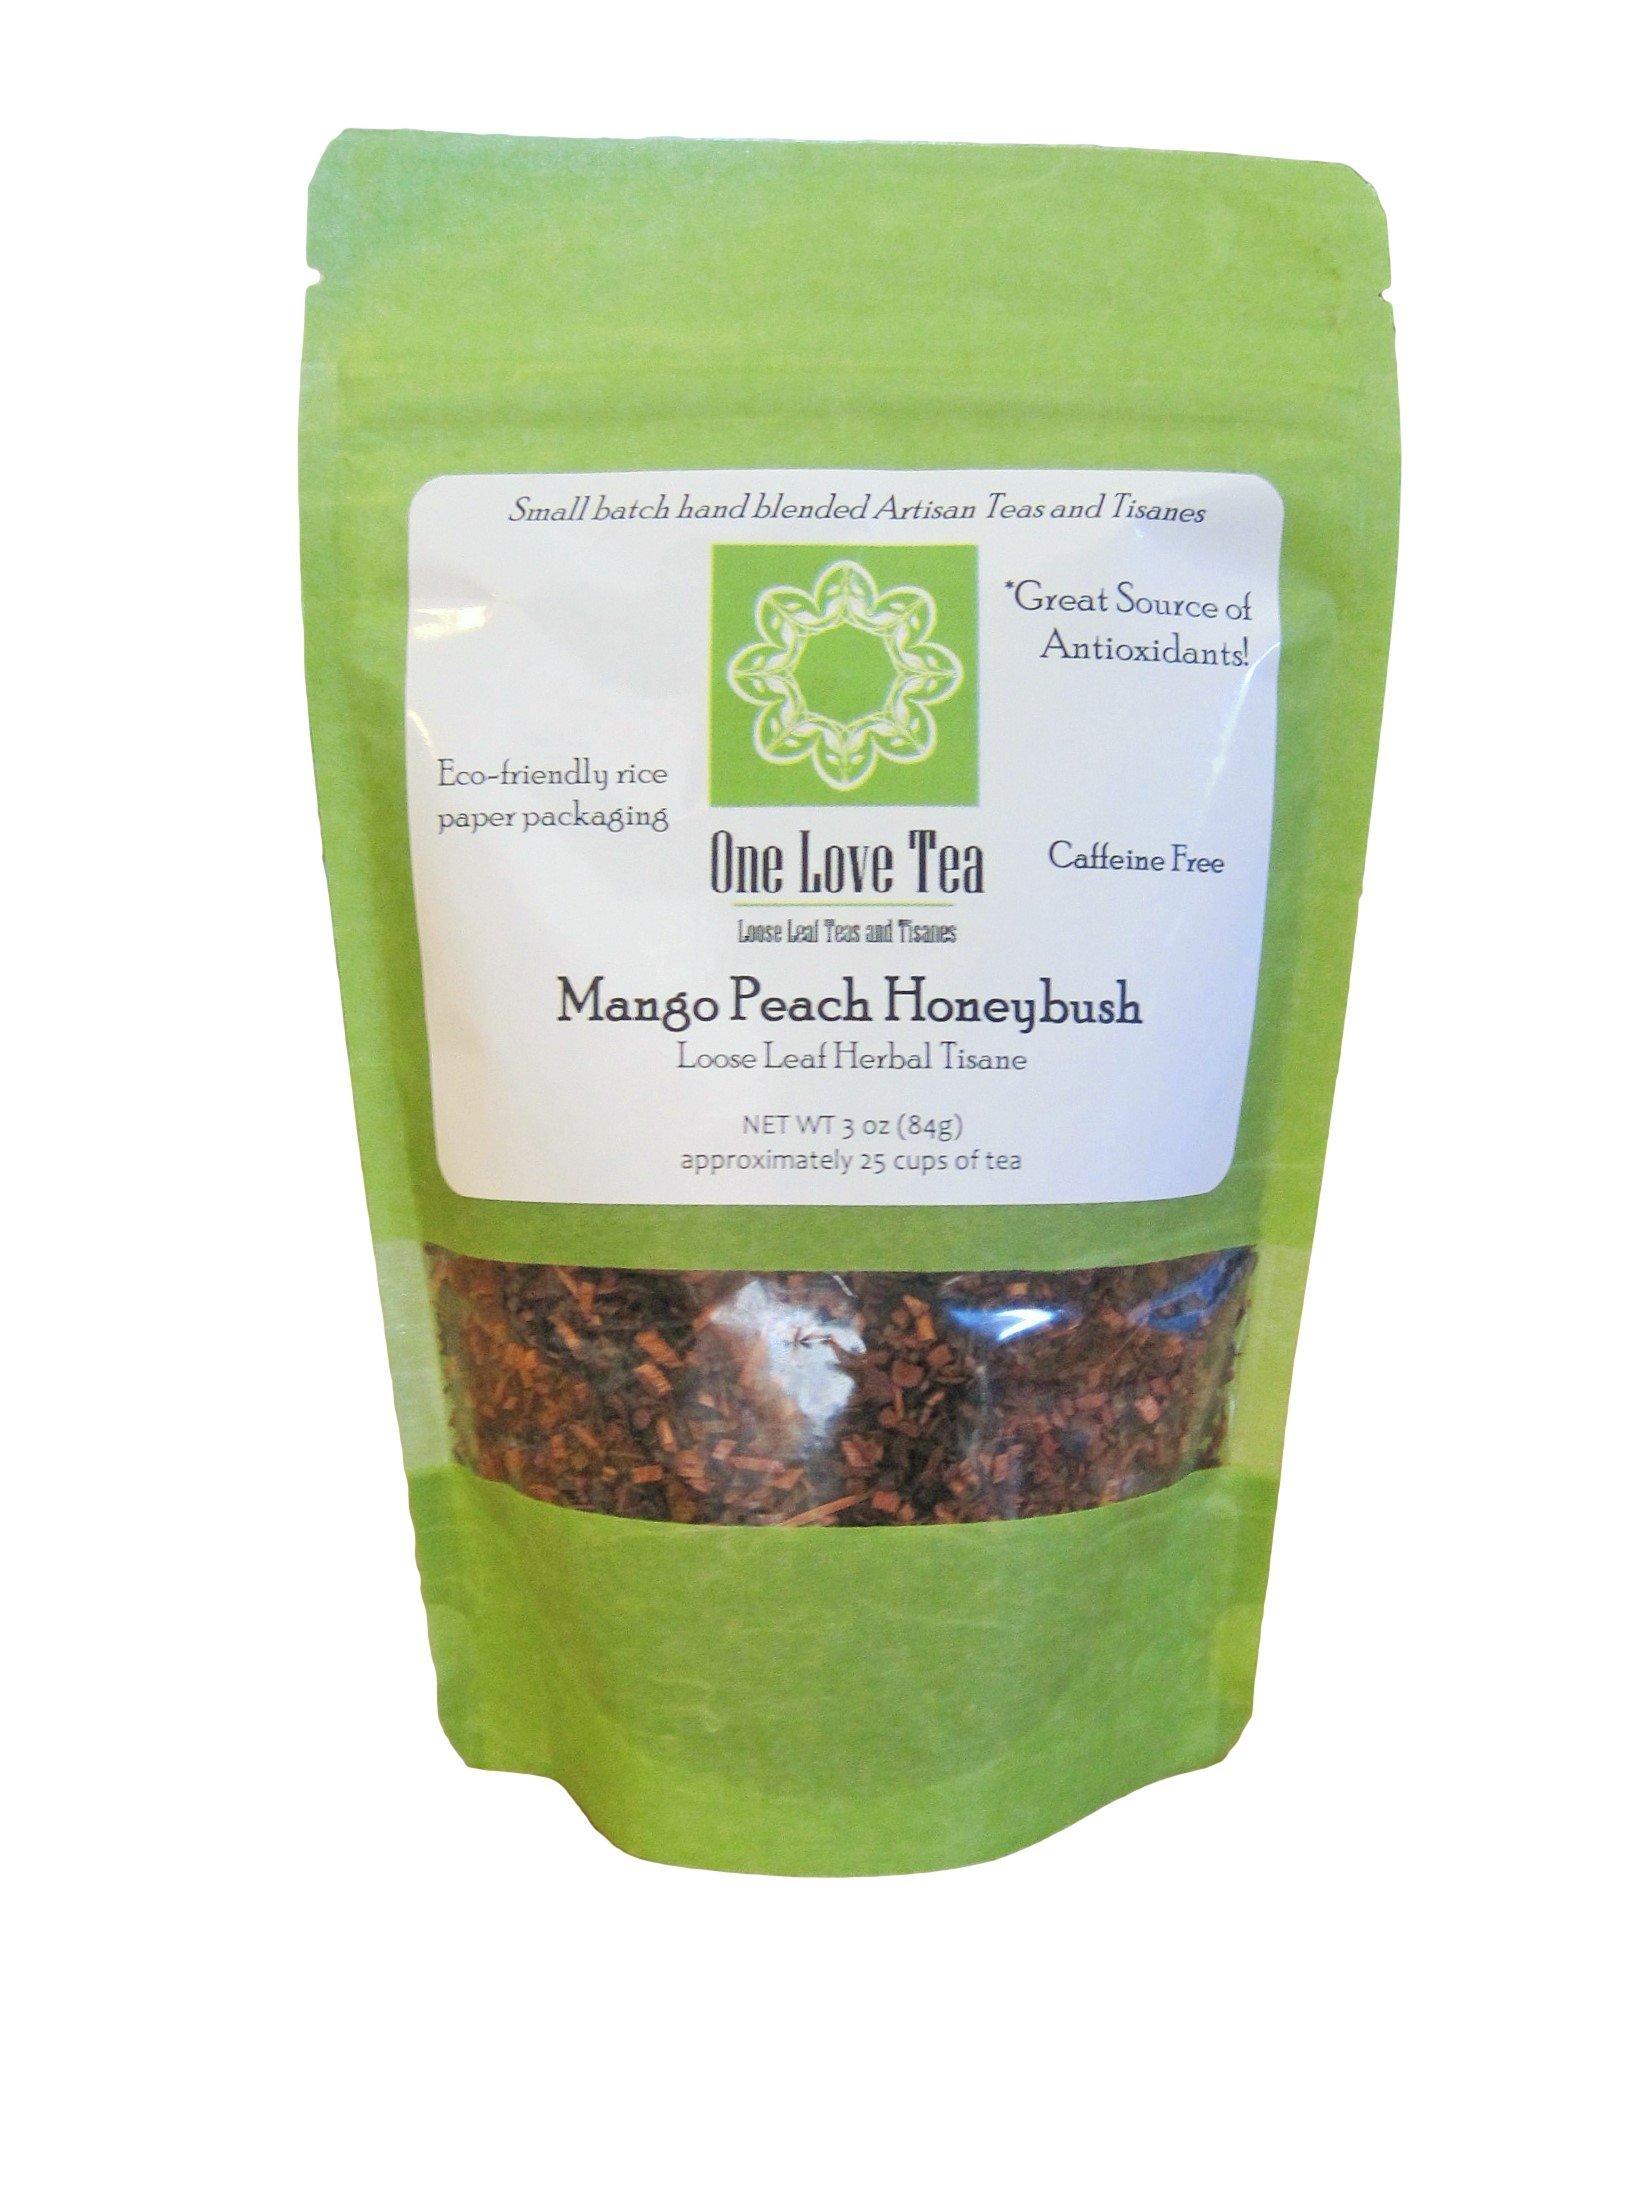 One Love Tea - Mango Peach Honeybush - 3 Oz Loose Leaf Herbal Tisane